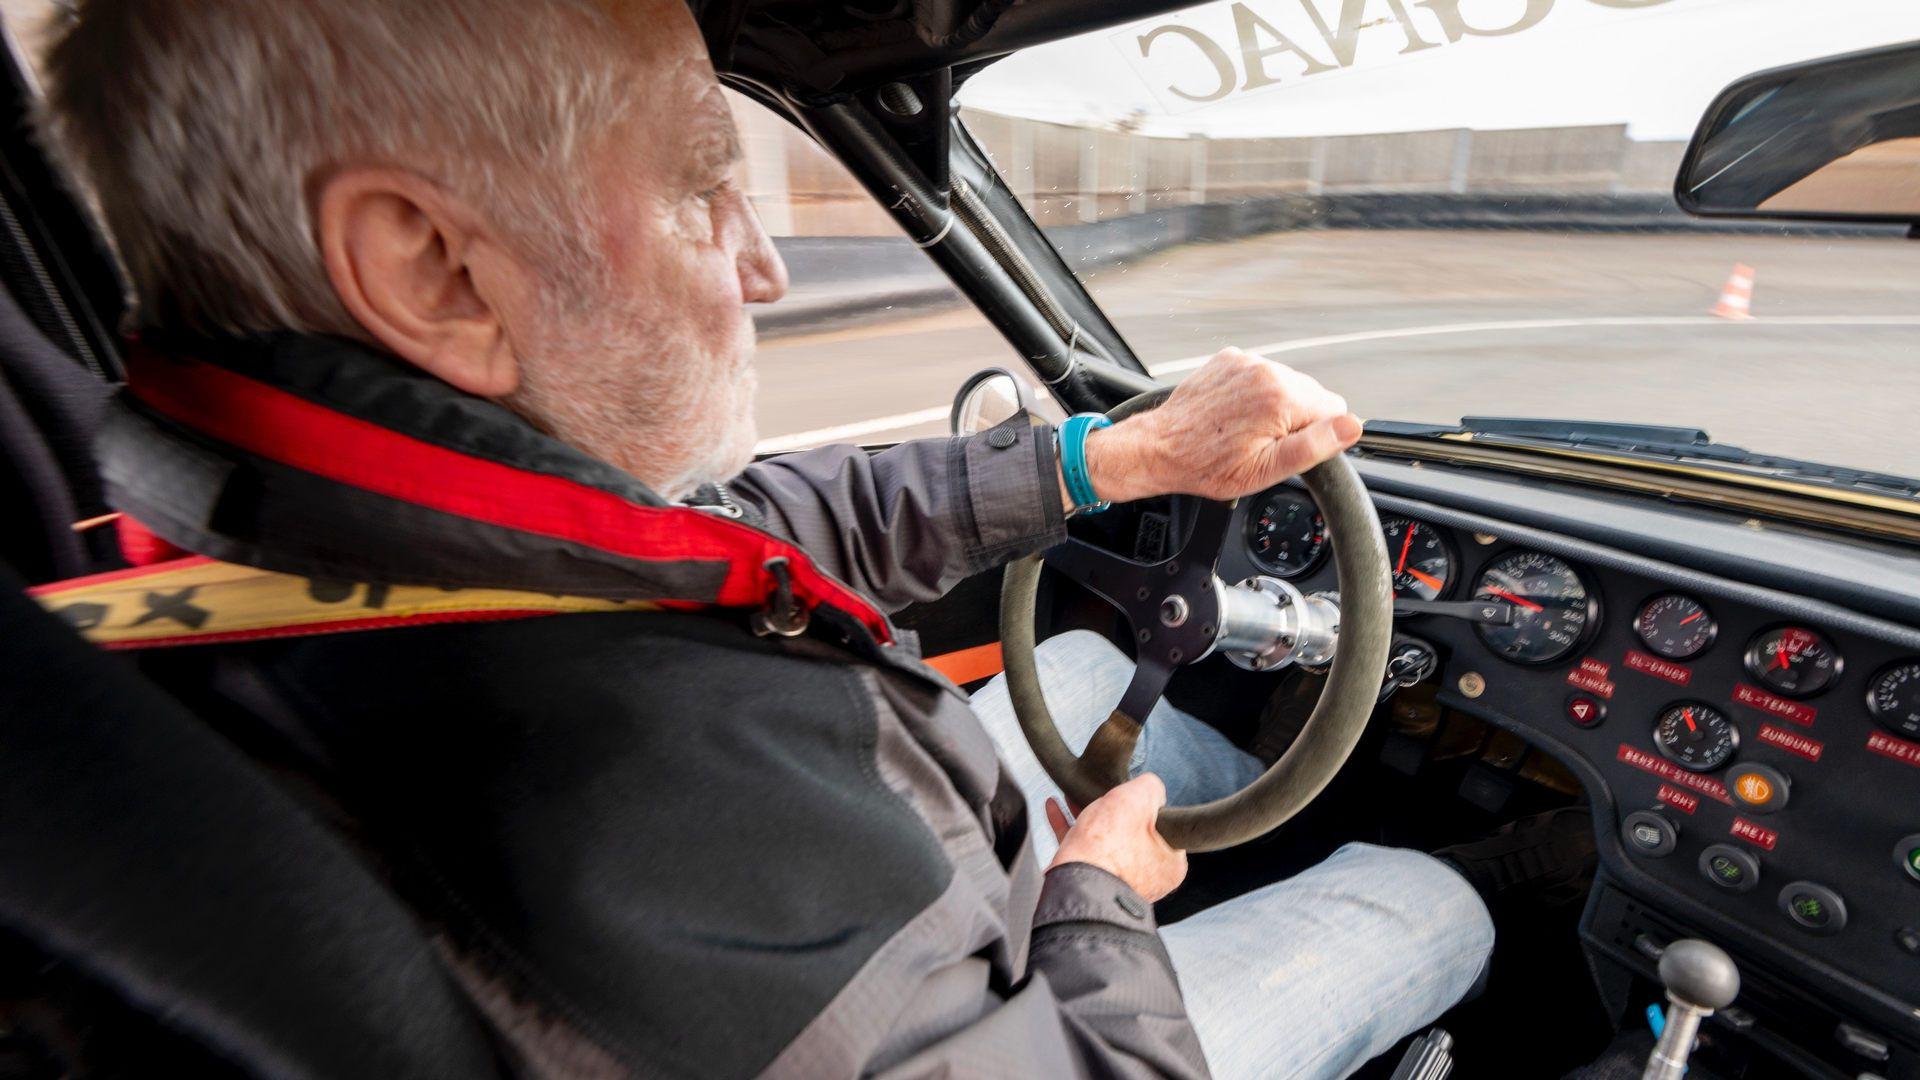 Porsche-924-Carrera-GTS-rally-car-Walter-Rohrl-34